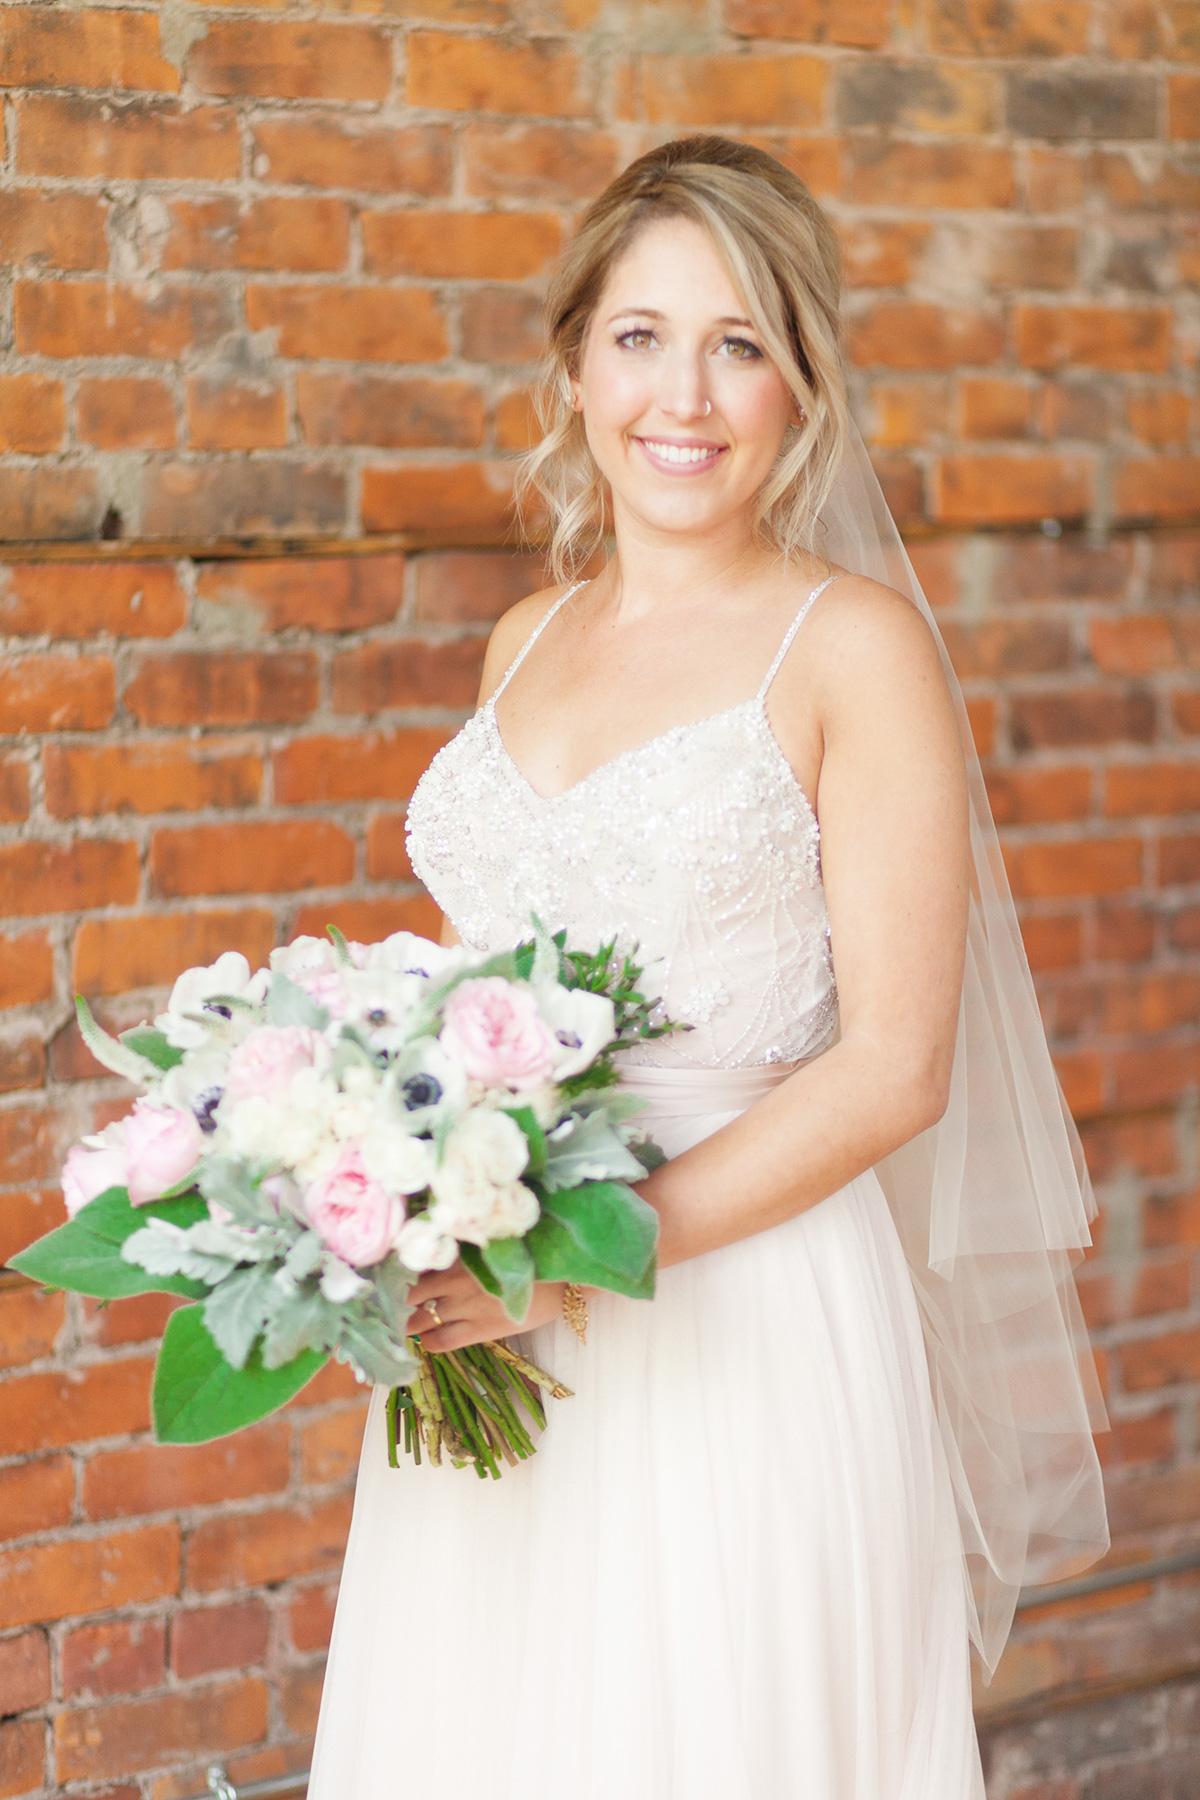 jennifer-xu-photography-vineyard-bride-swish-list-spice-factory-hamilton-wedding-18.jpg